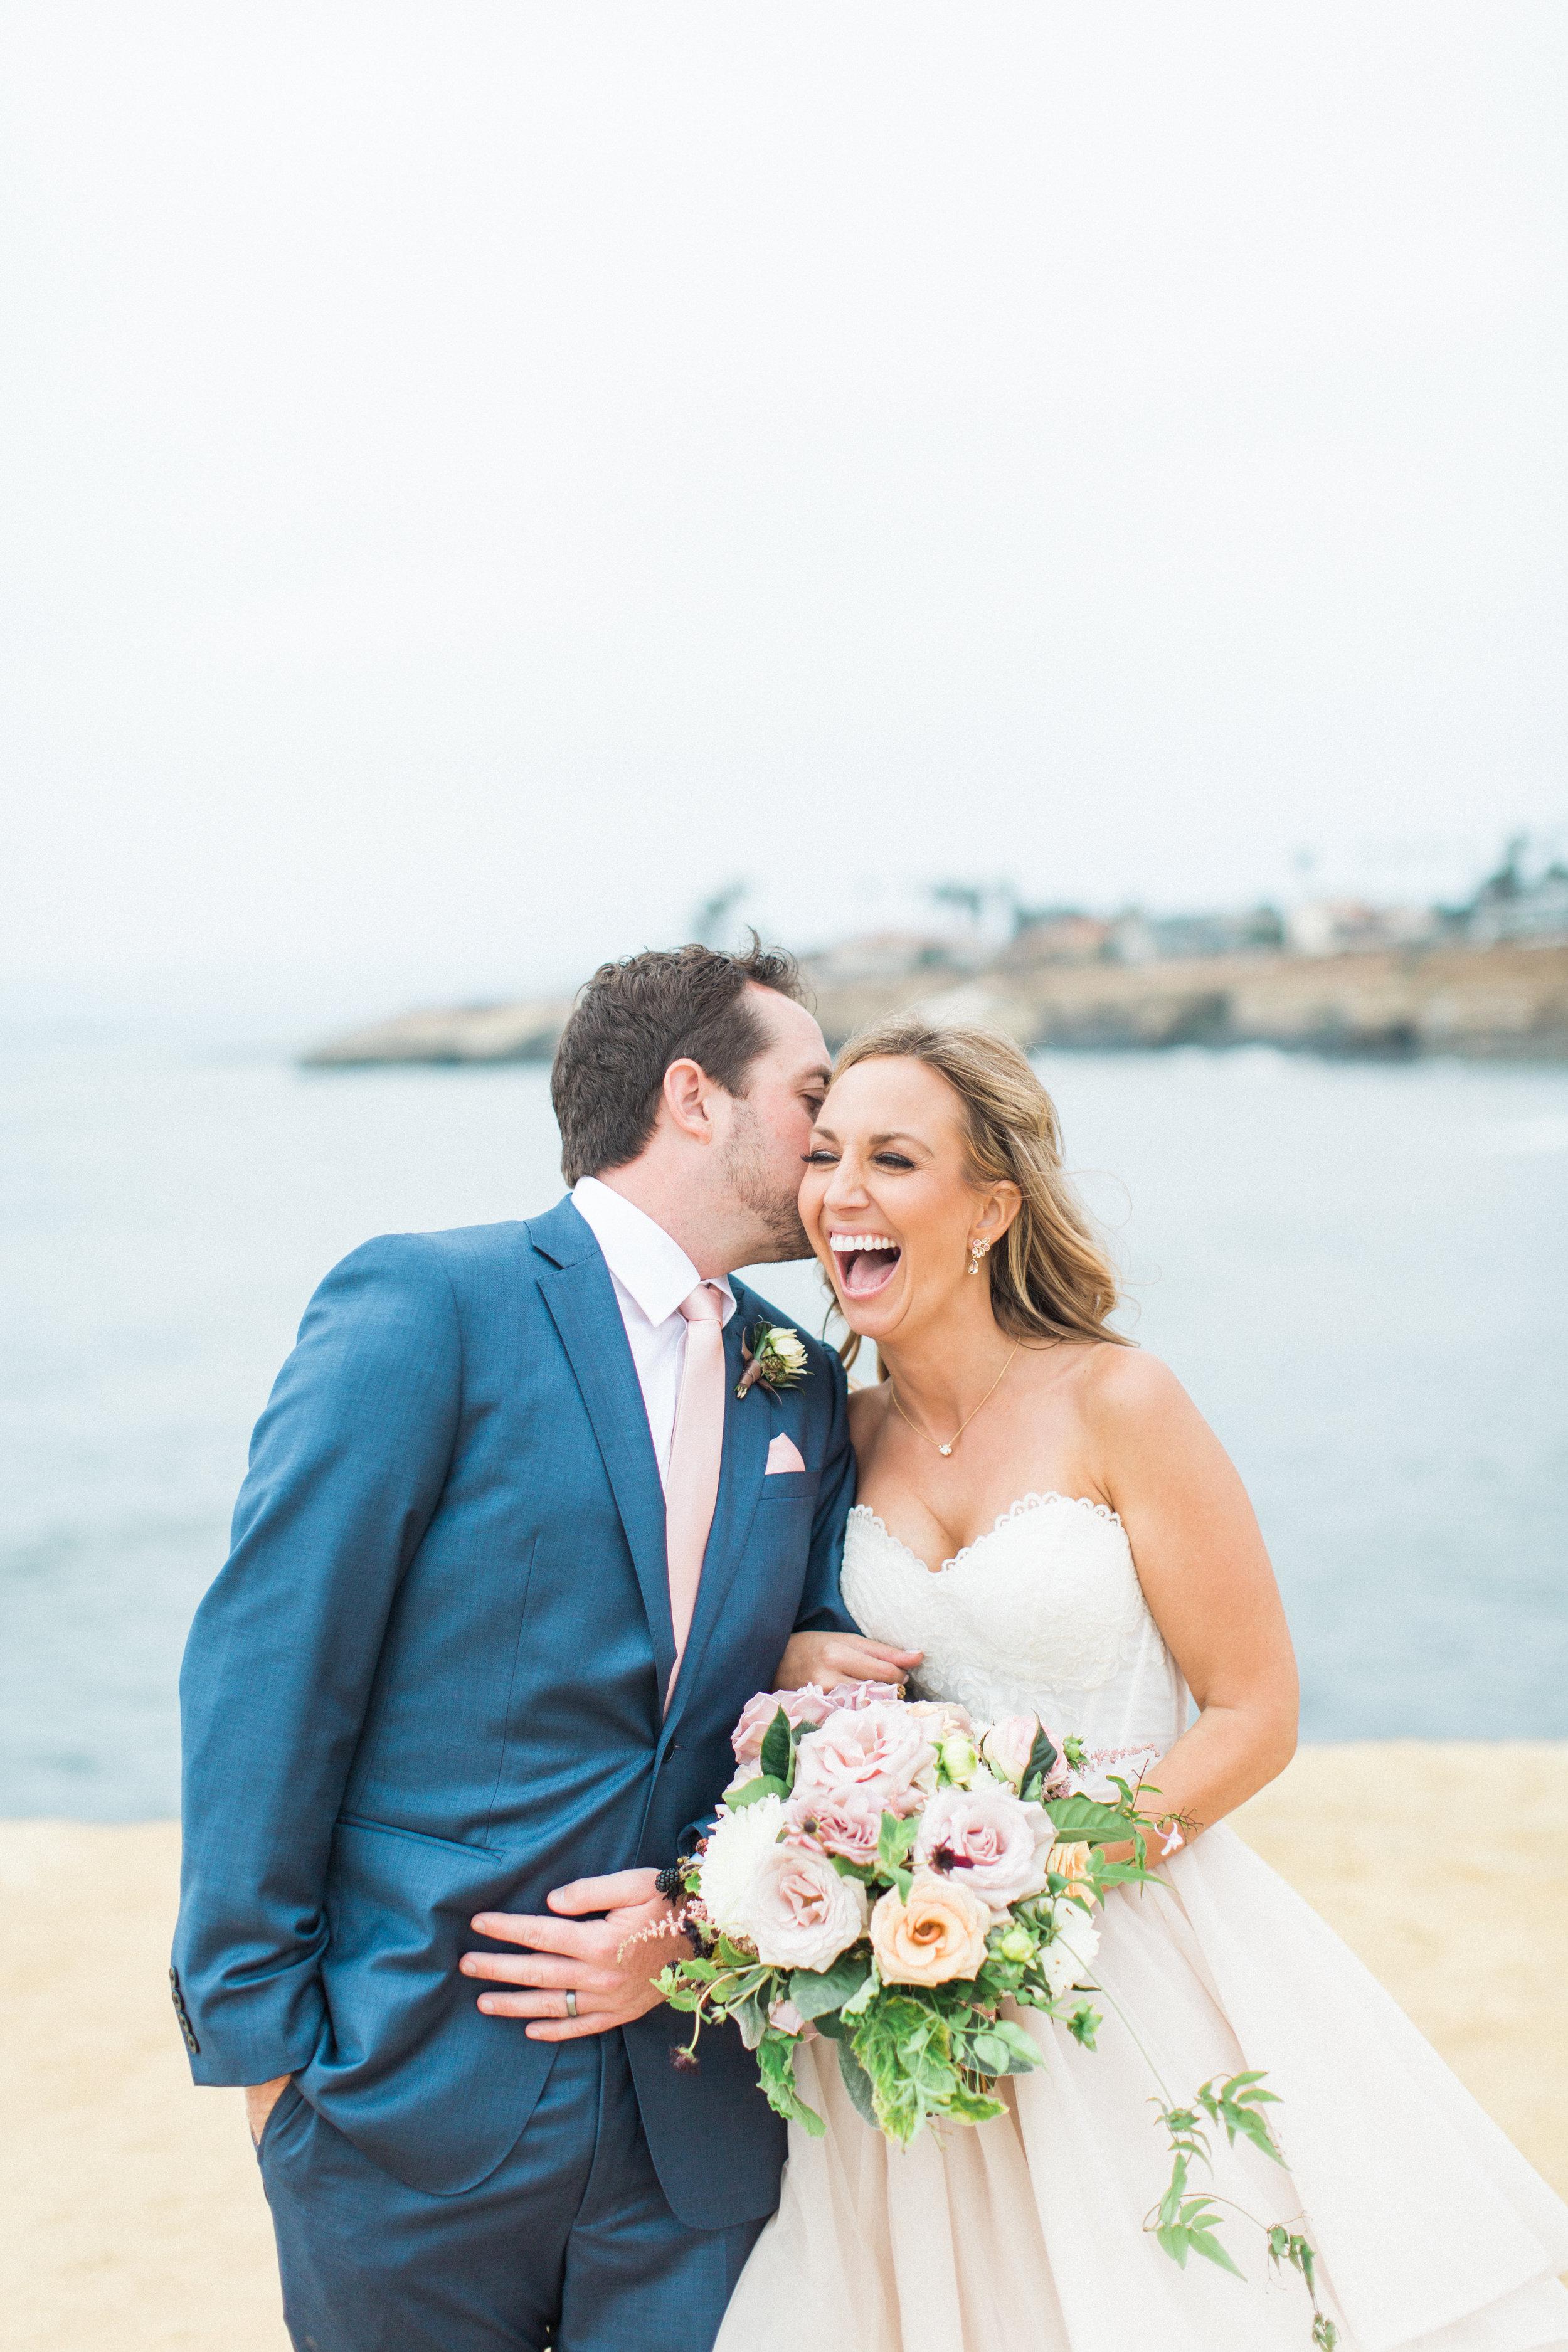 Blooms-breesa-lee-luxury-florist-aga-jones-tres-chic-affairs-san-diego-wedding-classic-coast-catering-(79).jpg